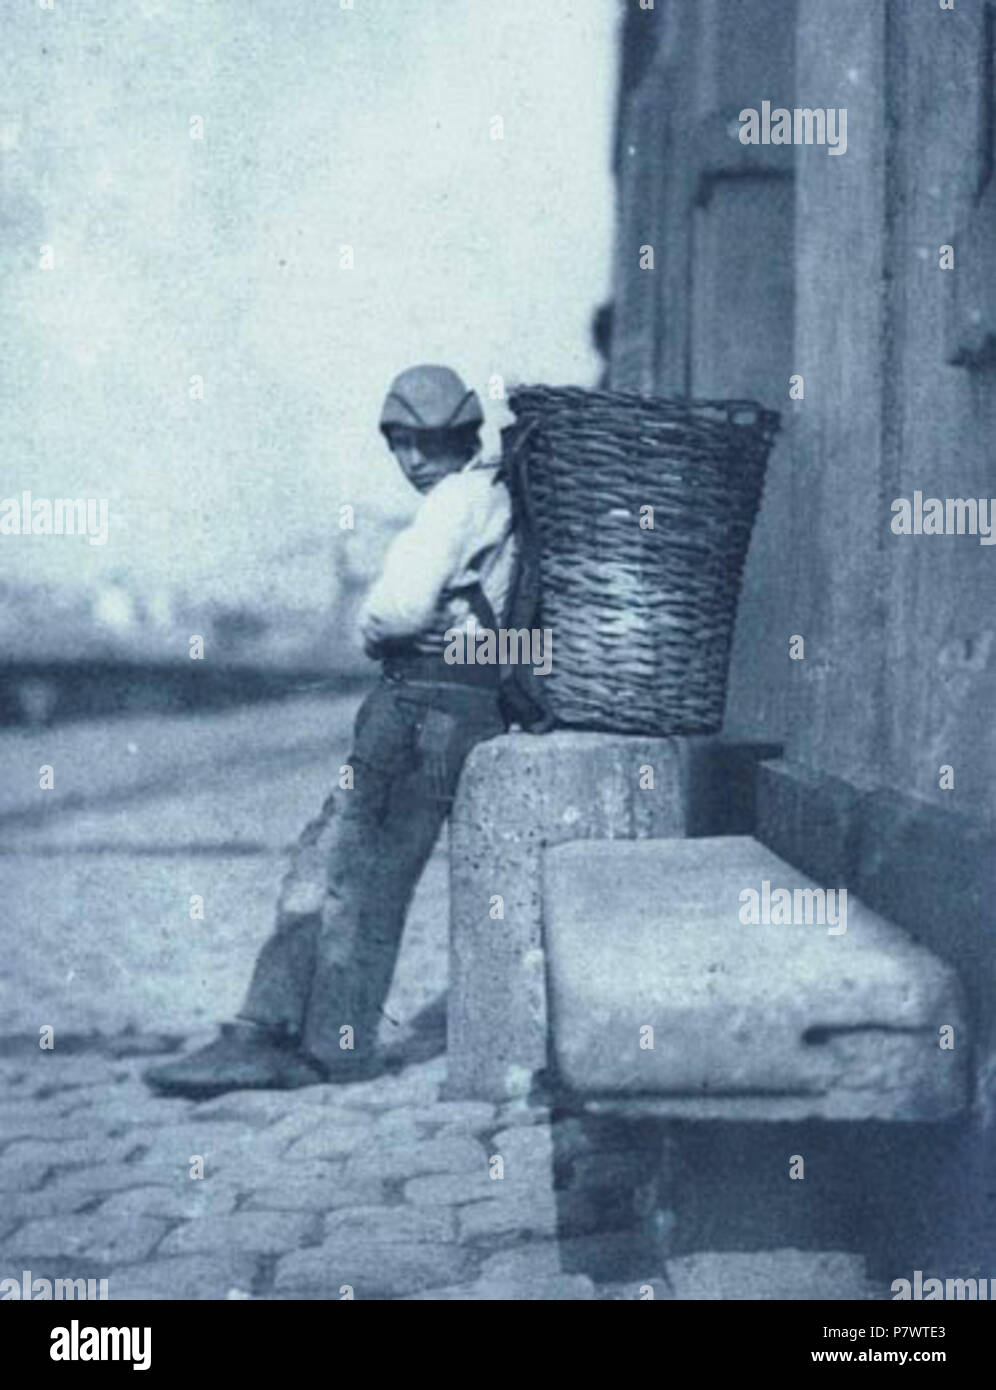 https www alamy com english le petit chiffonnier appuy contre une borne 1851 90 chiffonnier02 negre image211395019 html